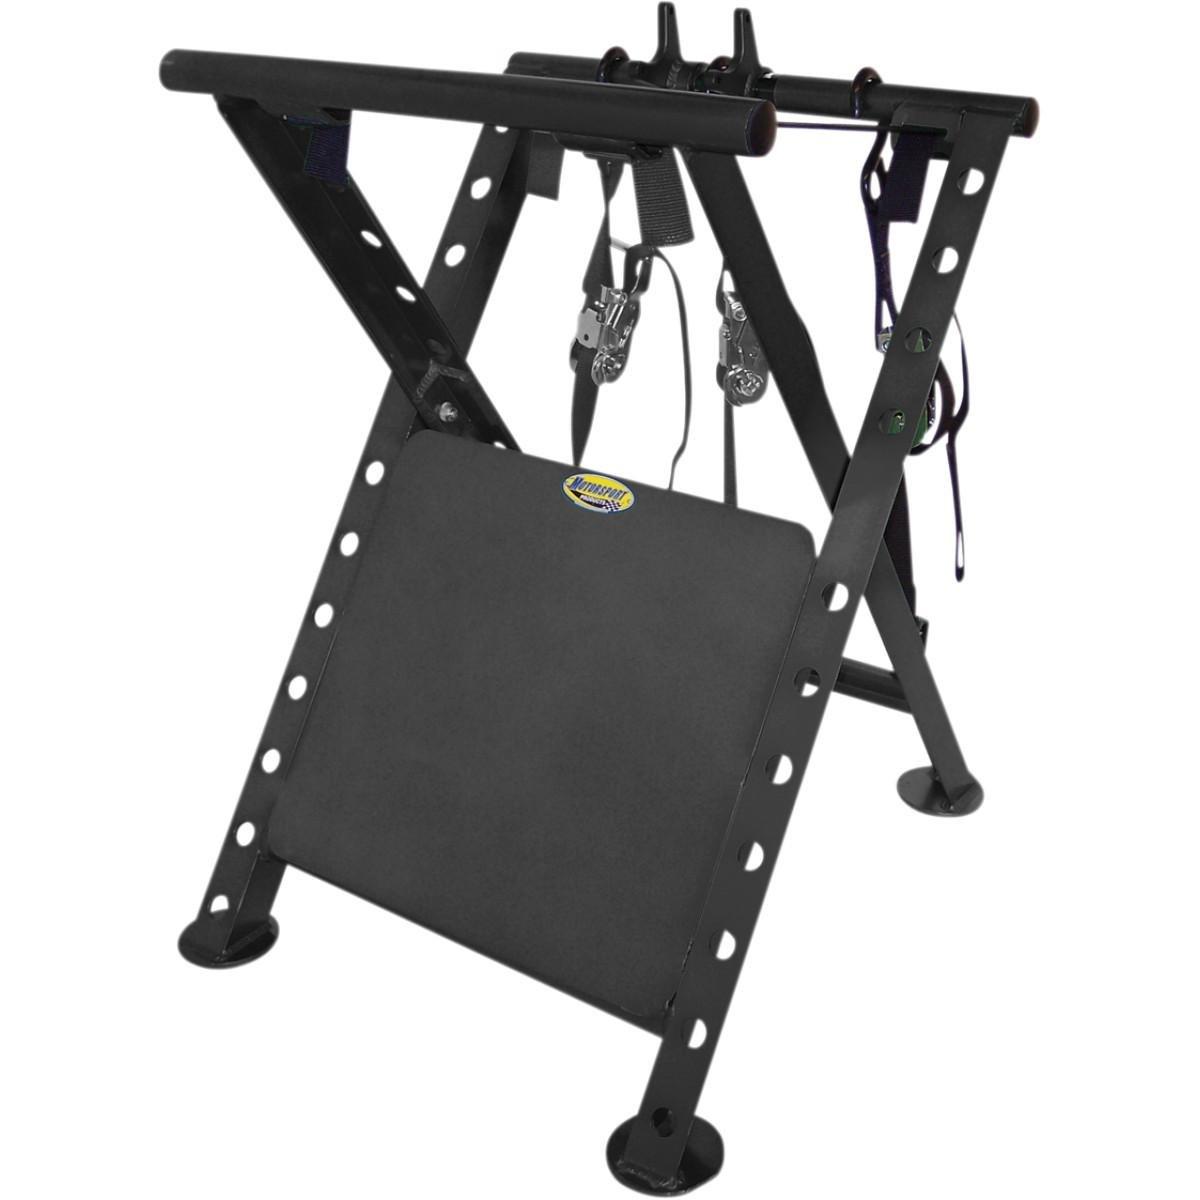 Motorsport Products Pro ATV X-Stand Black 90-2012